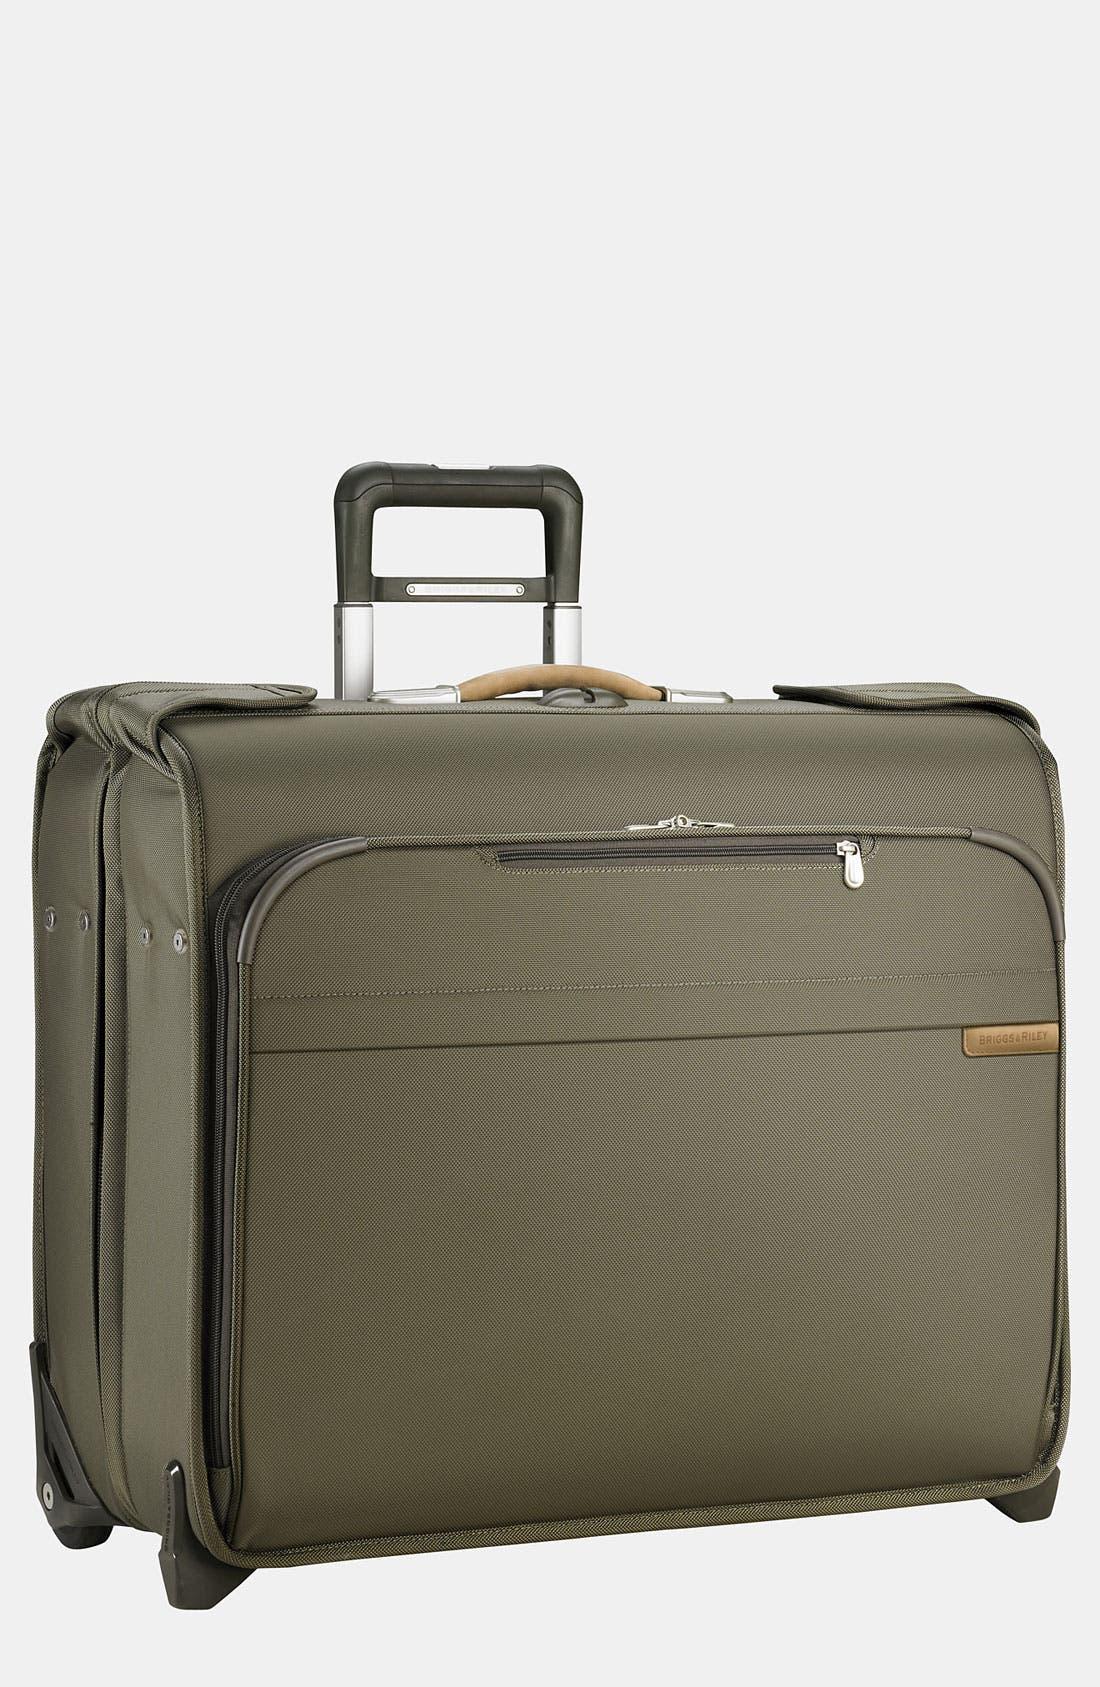 BRIGGS & RILEY Baseline - Deluxe Rolling Garment Bag